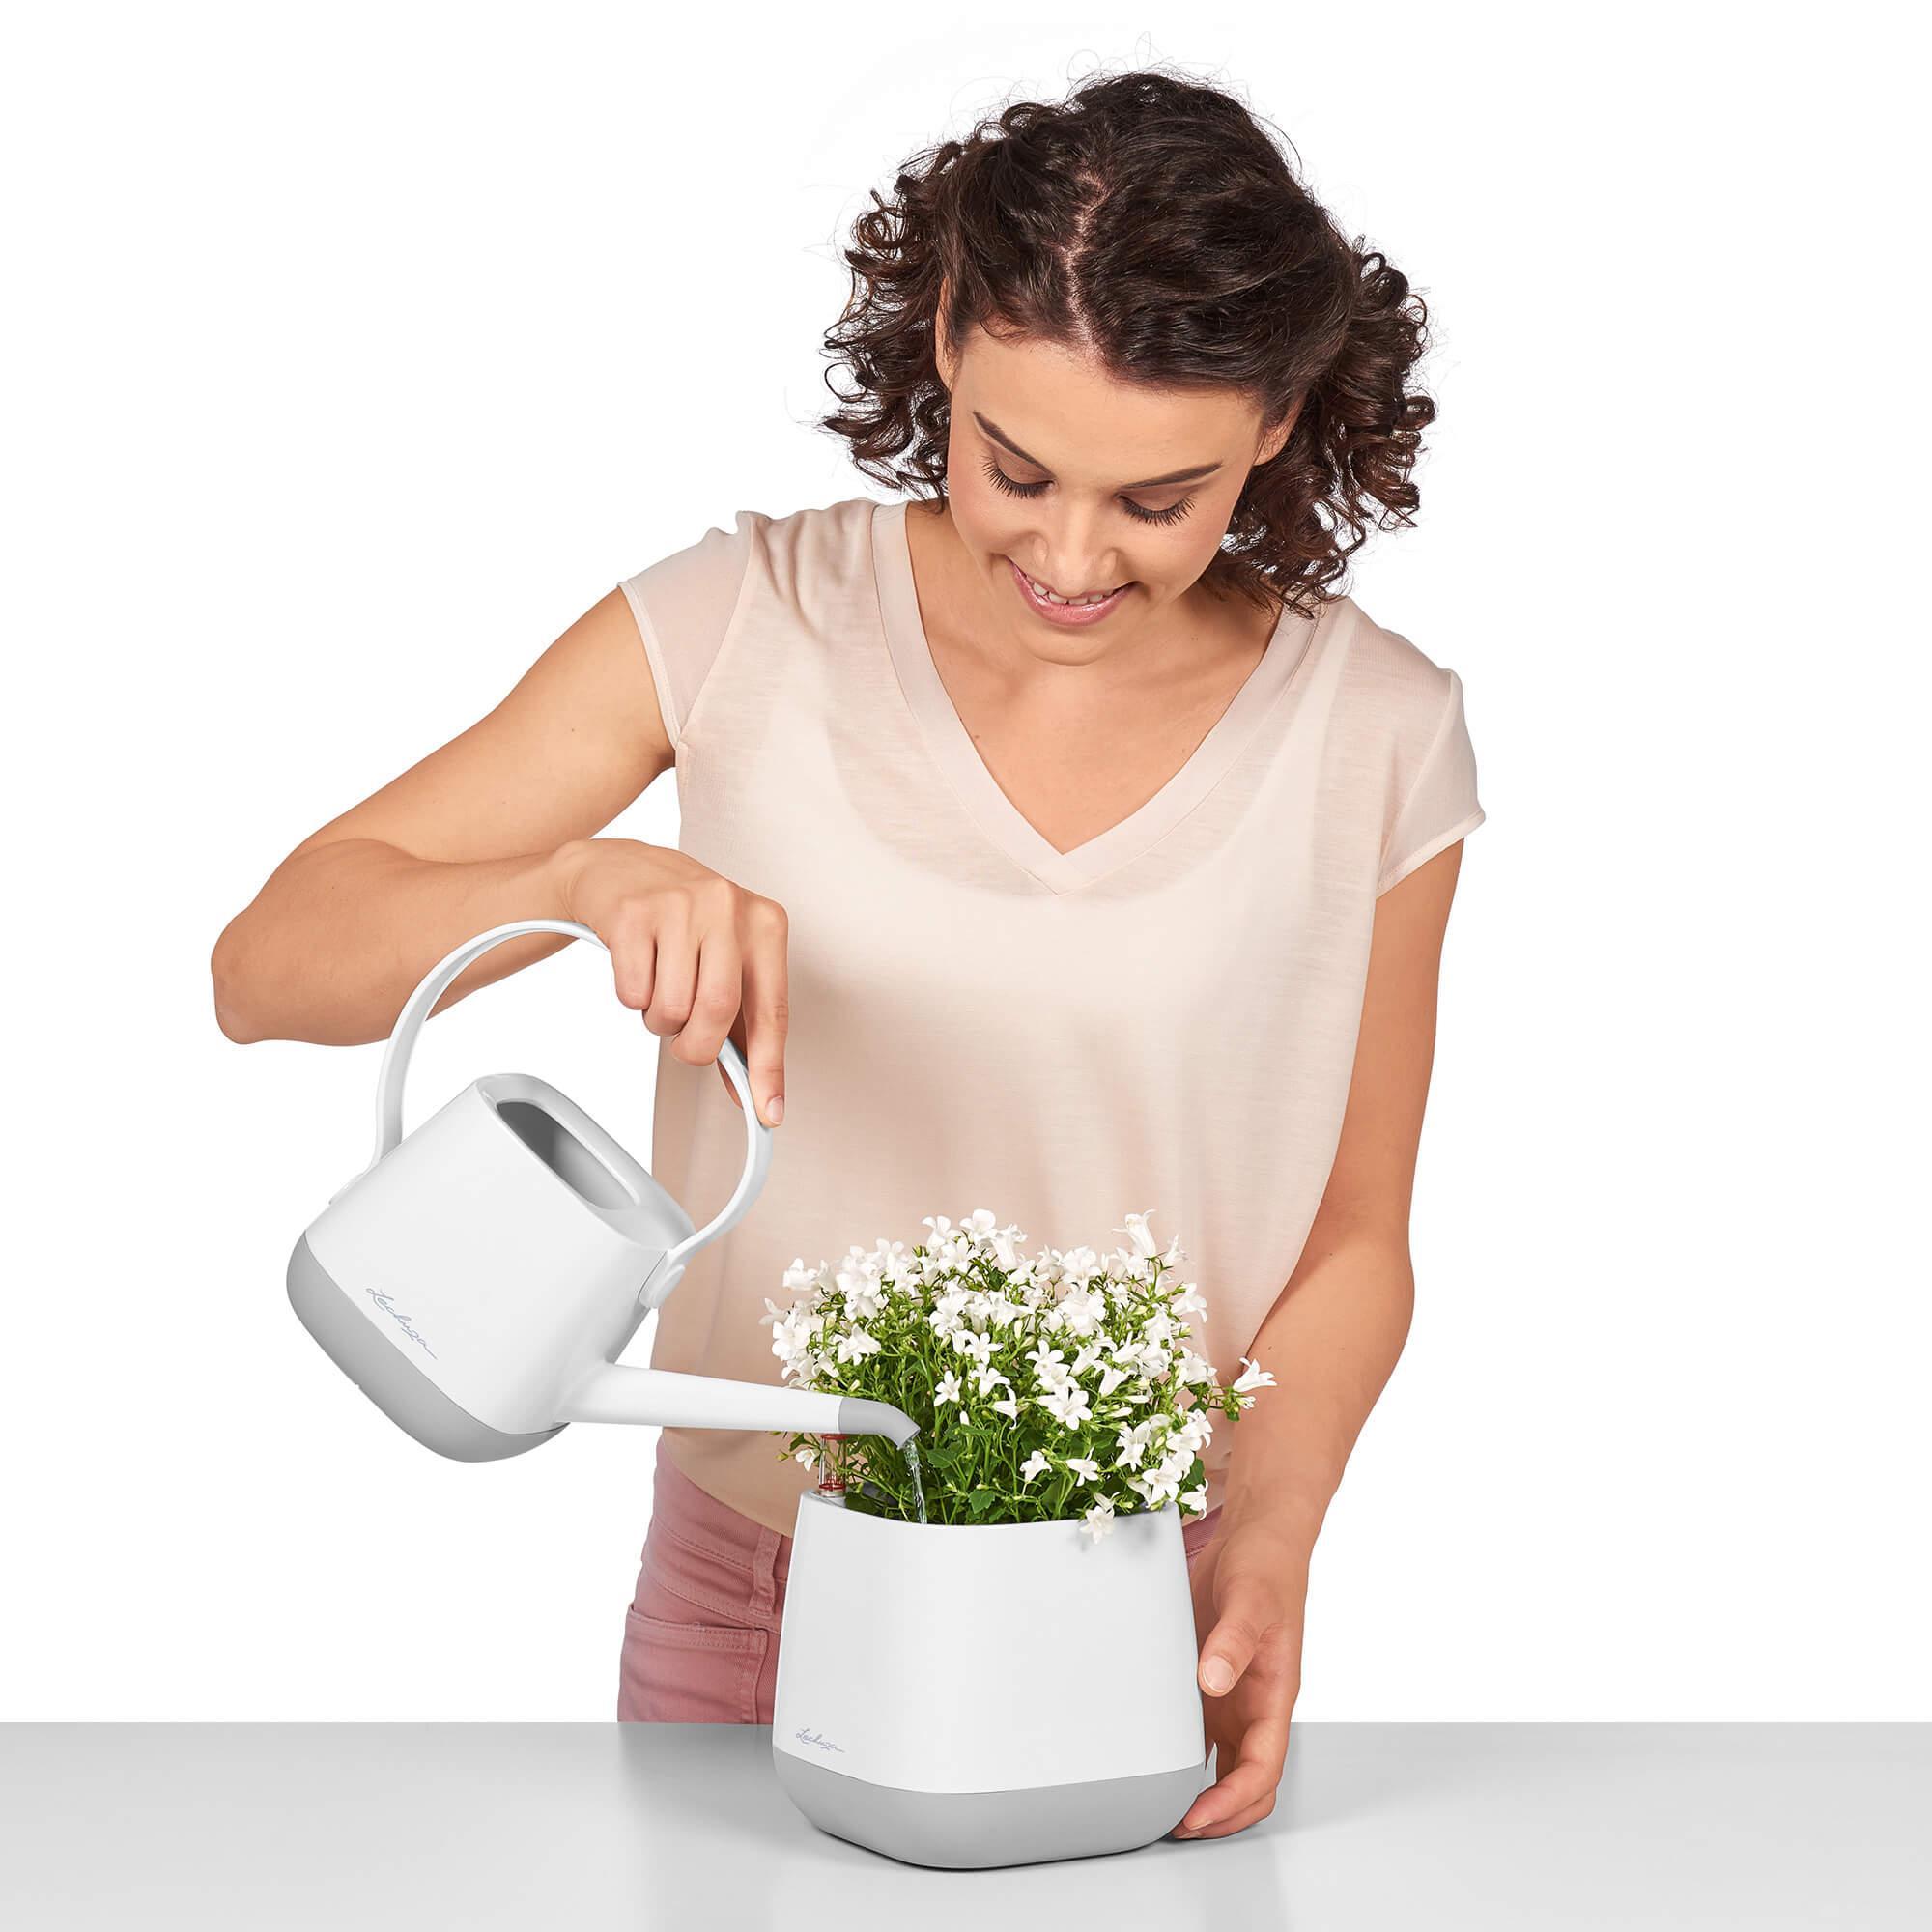 YULA planter white/pistachio semi-gloss - Image 11